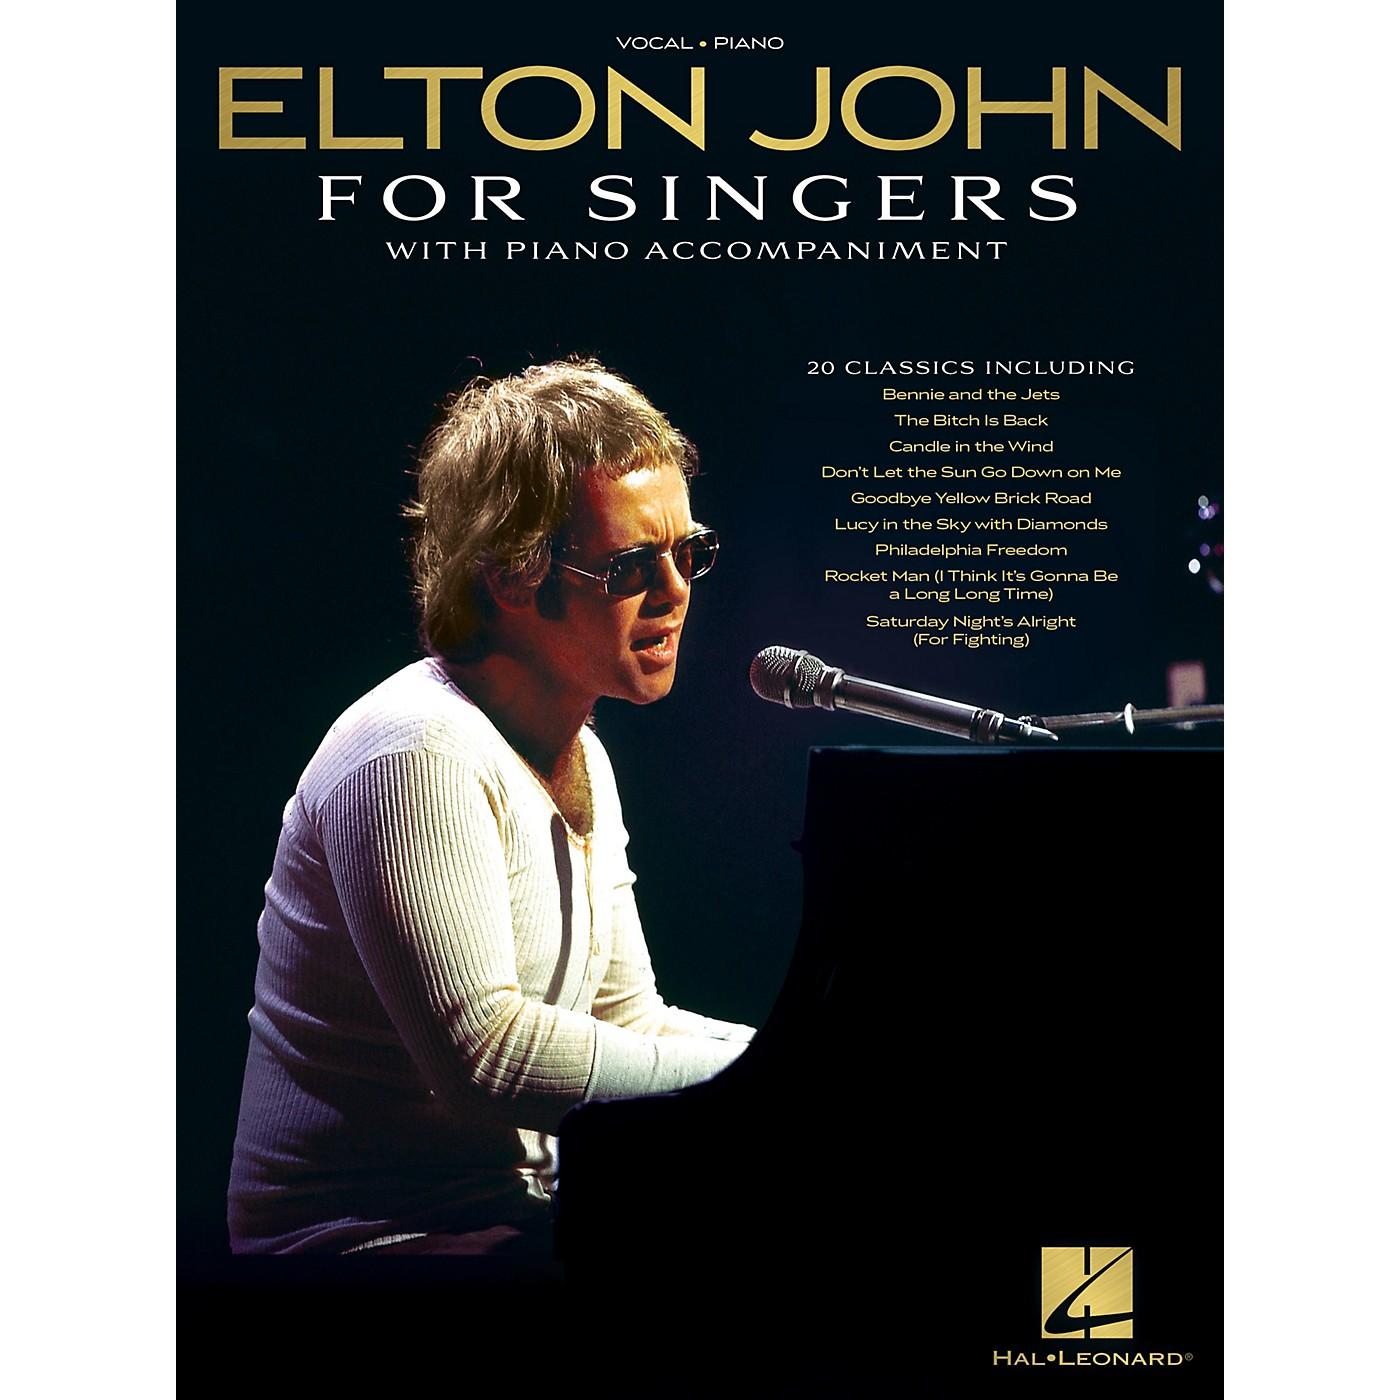 Hal Leonard Elton John for Singers (with Piano Accompaniment) Original Keys For Singers Songbook thumbnail